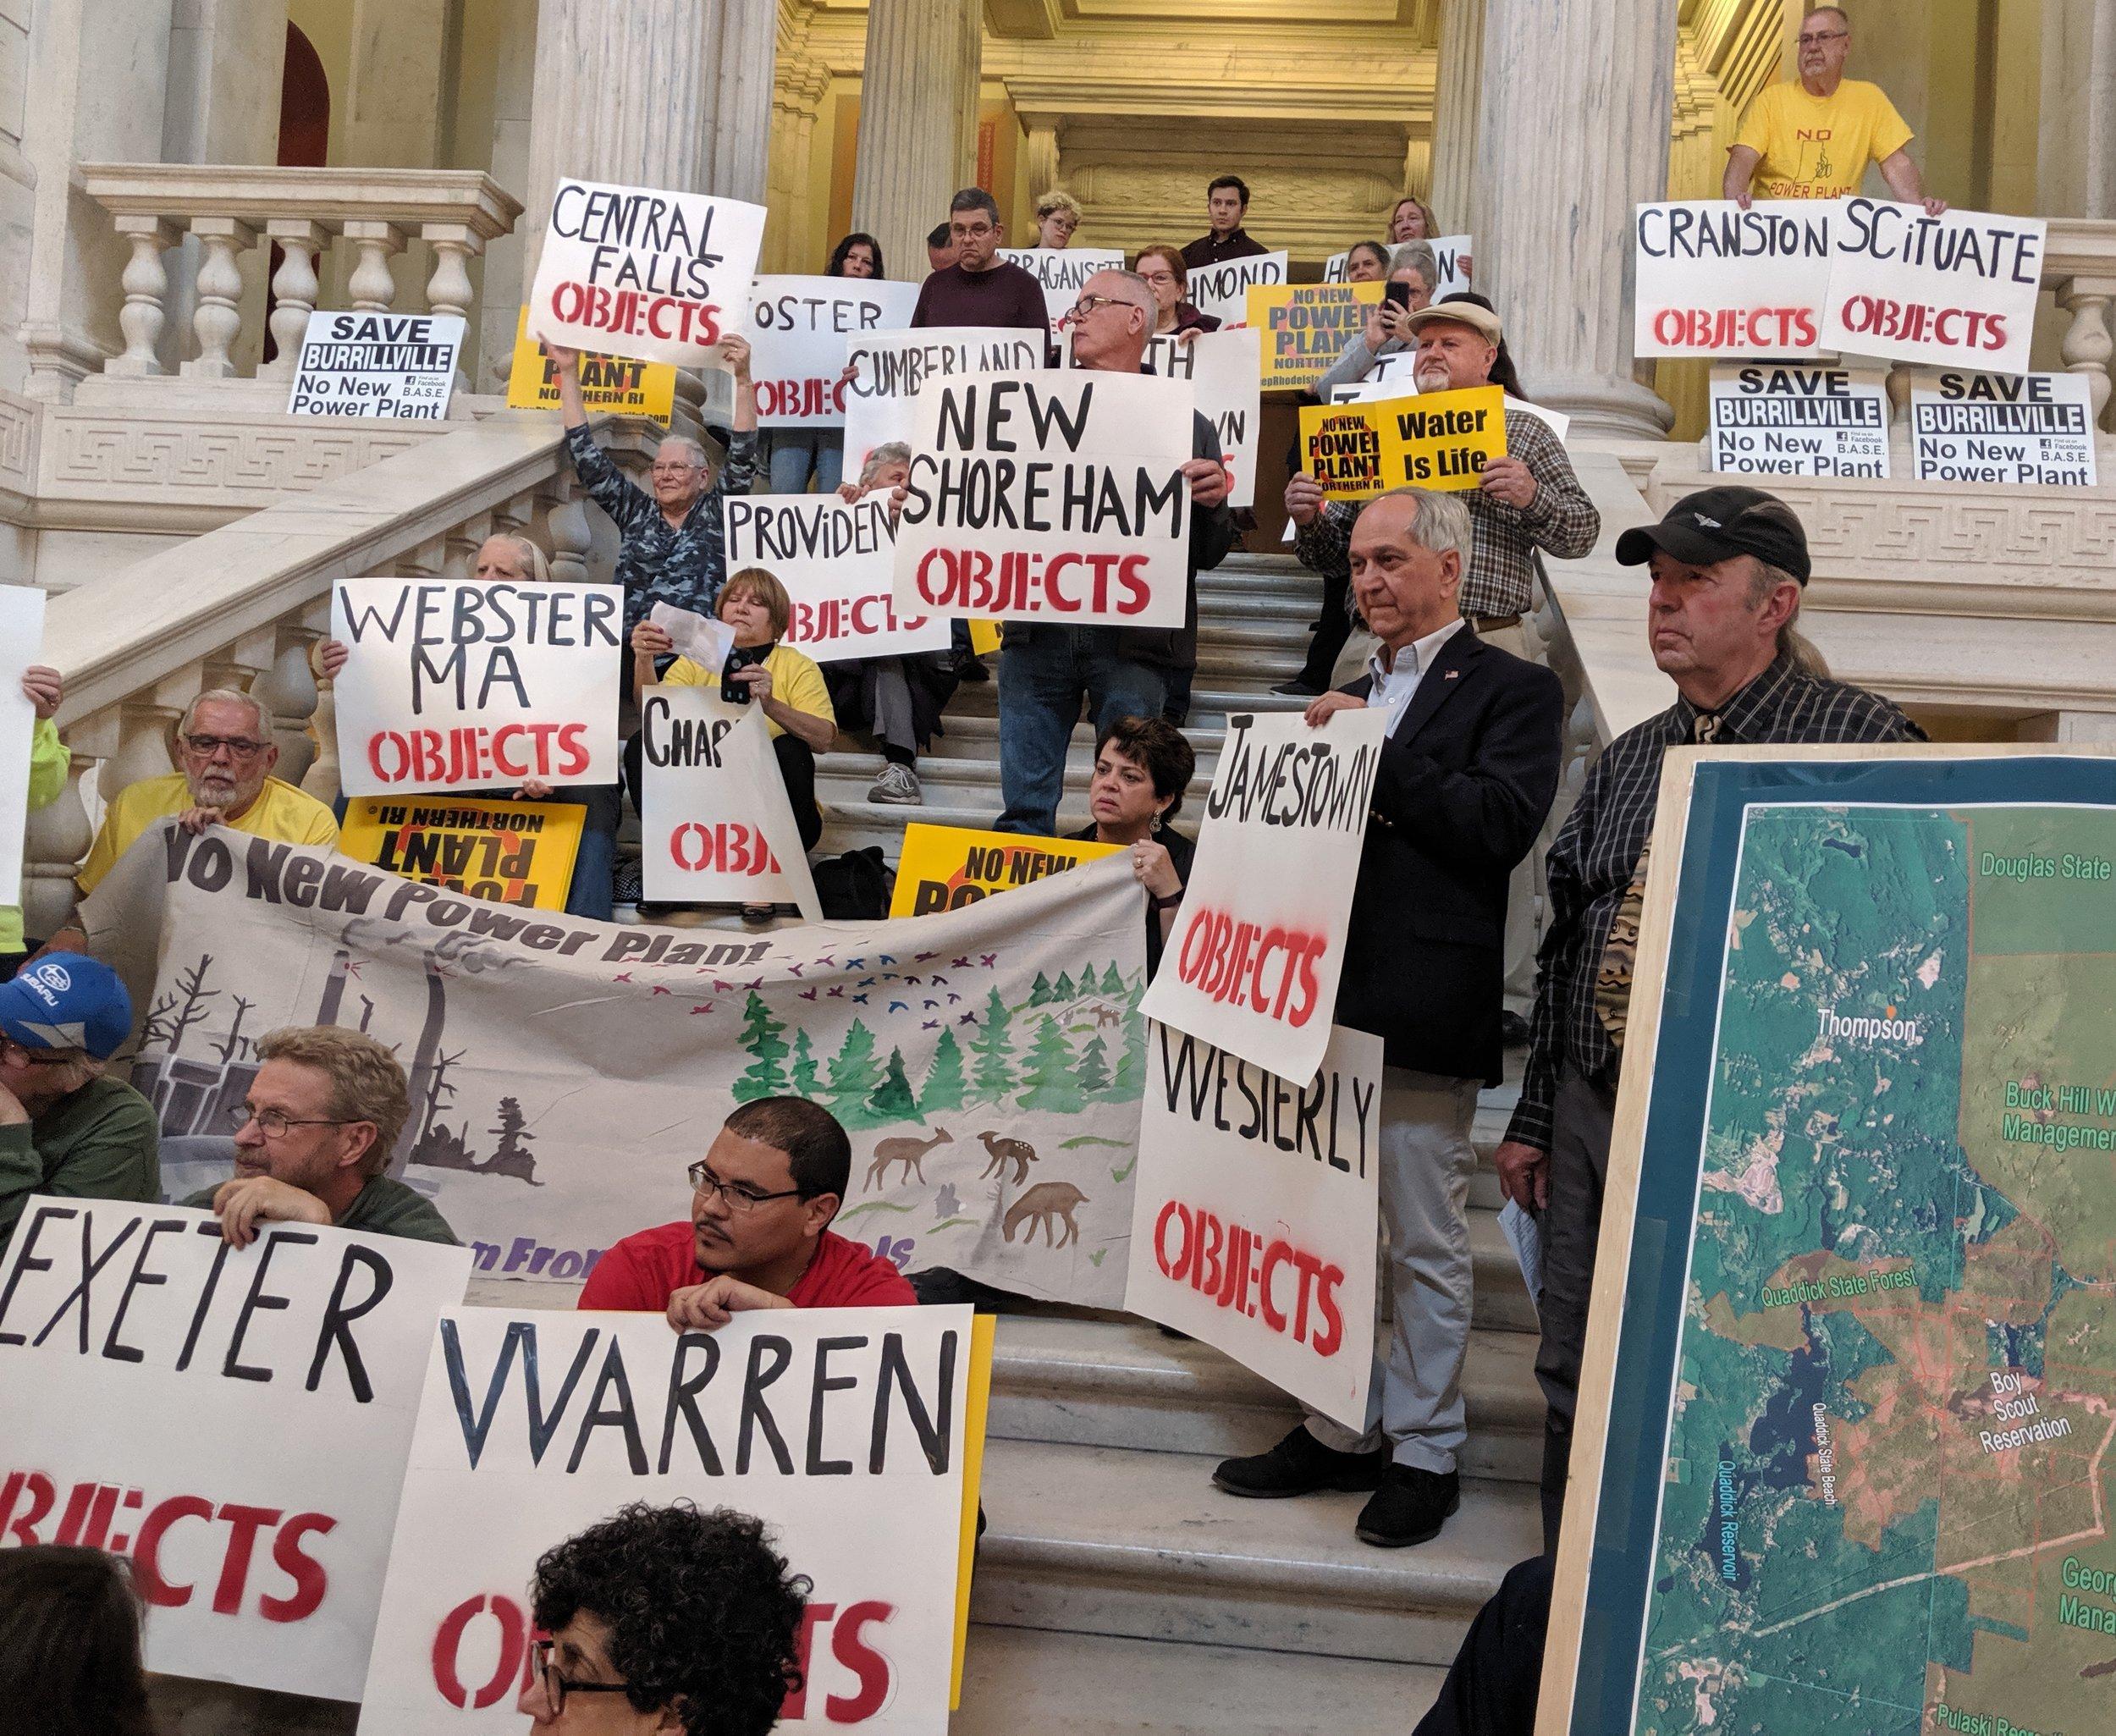 Thirty-nine communities in Rhode Island, Massachusetts, and Connecticut oppose the proposed Burrillville power plant. (Tim Faulkner/ecoRI News)